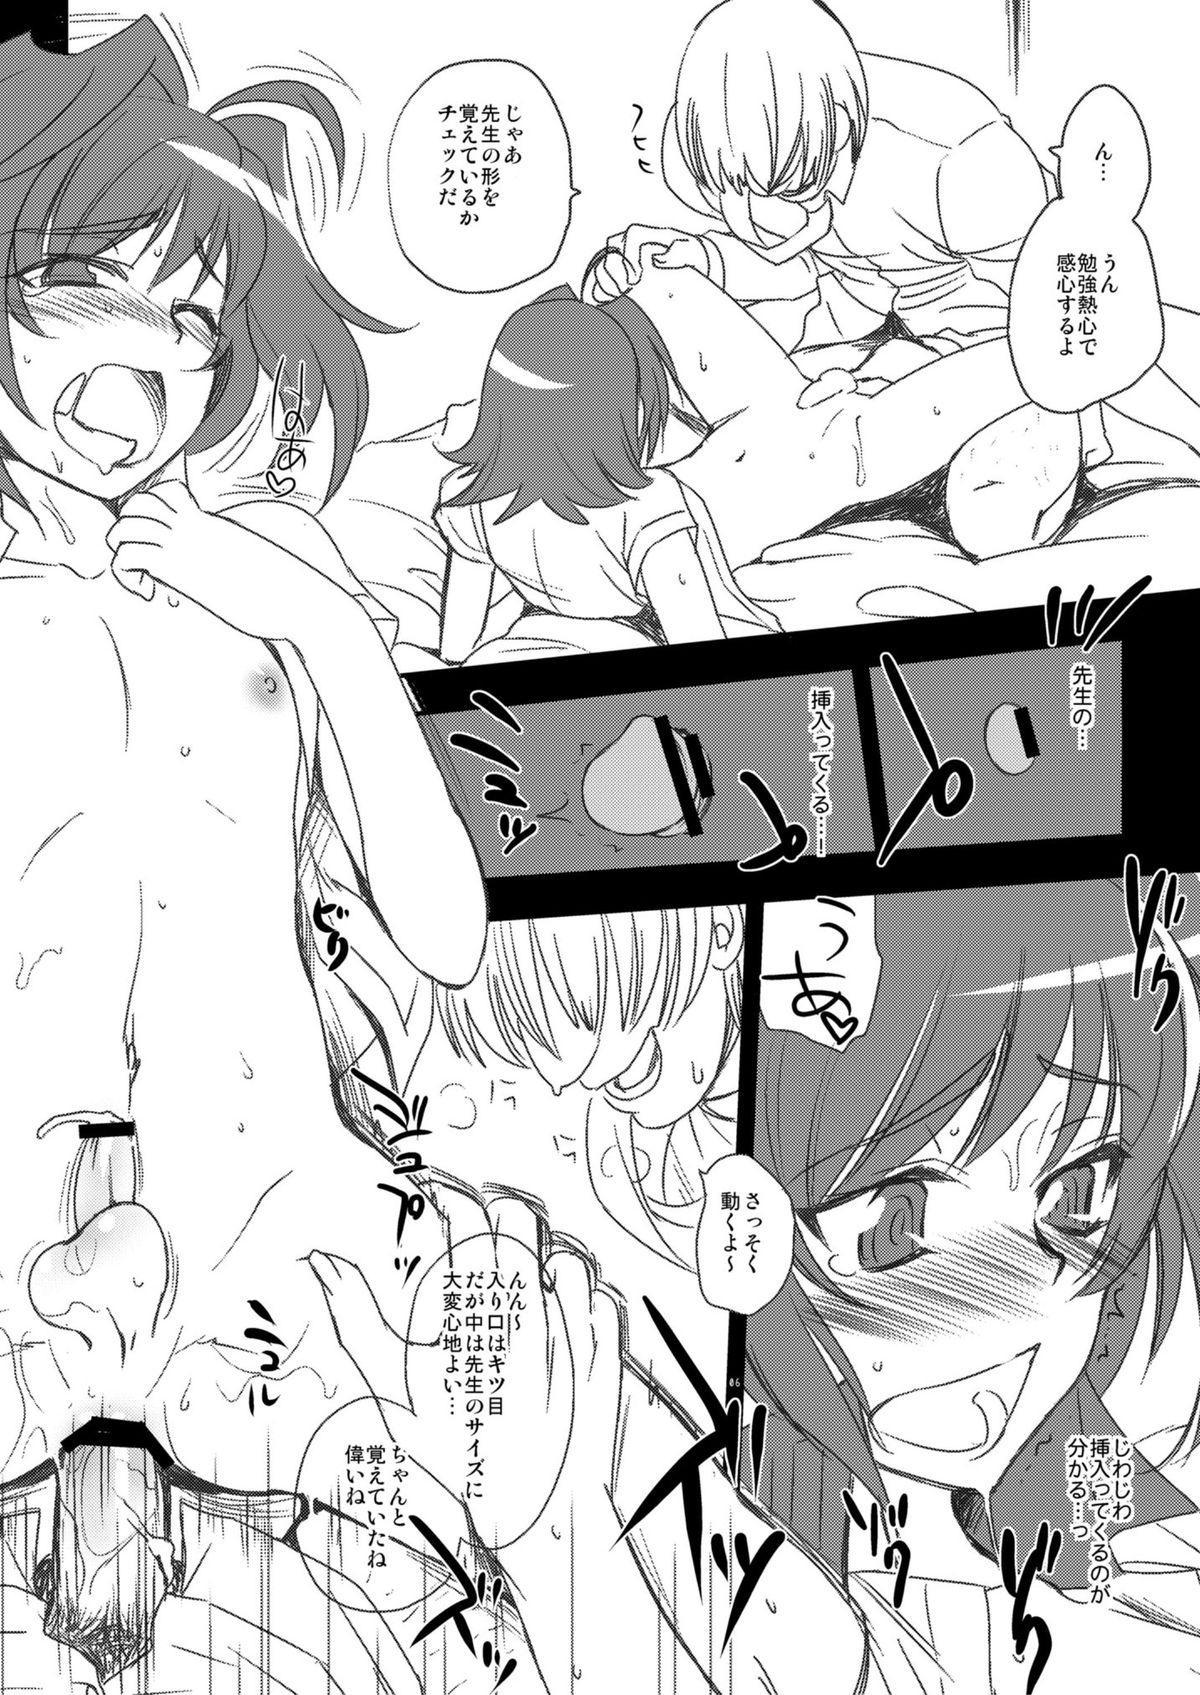 Tachikawa Negoro(kitsune)Tutor ride! Attack in Aichi!(Cardfight!! Vanguard) 5